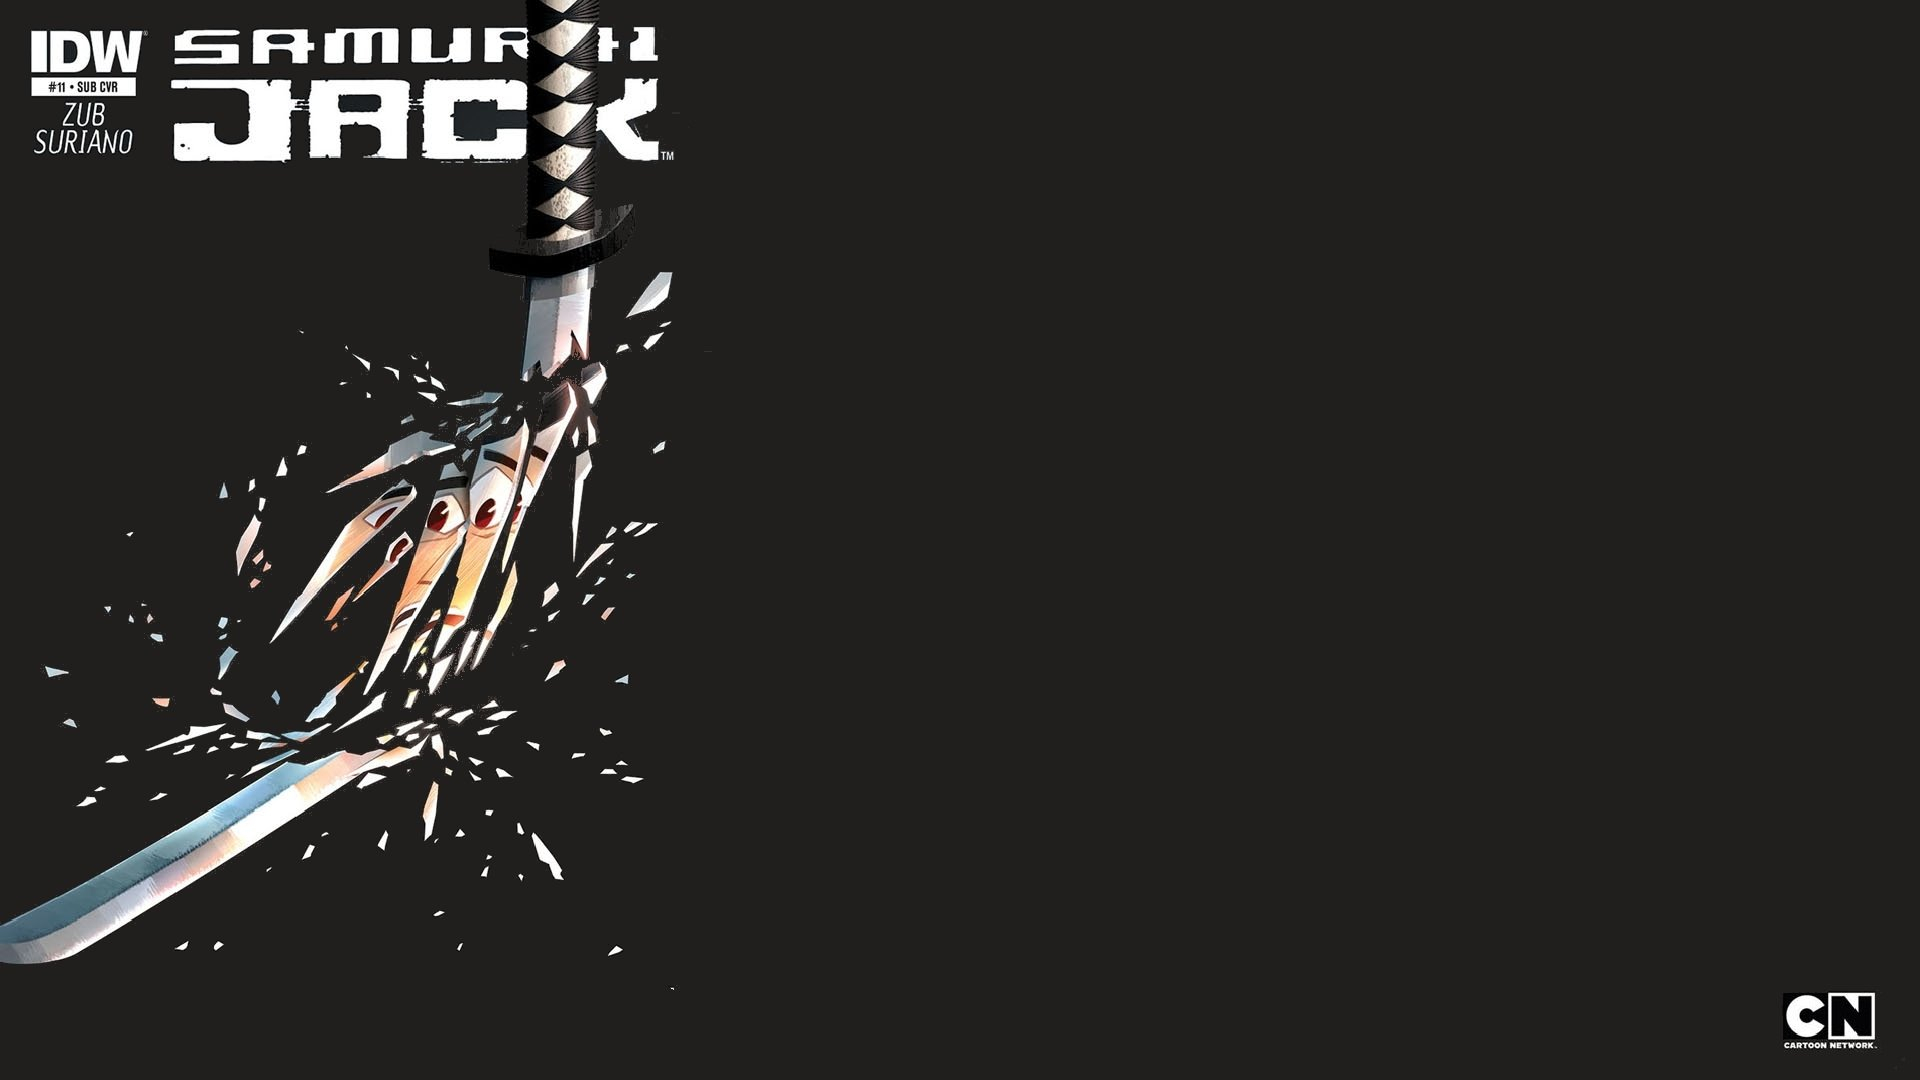 samurai jack hd wallpaper | hintergrund | 1920x1080 | id:518055